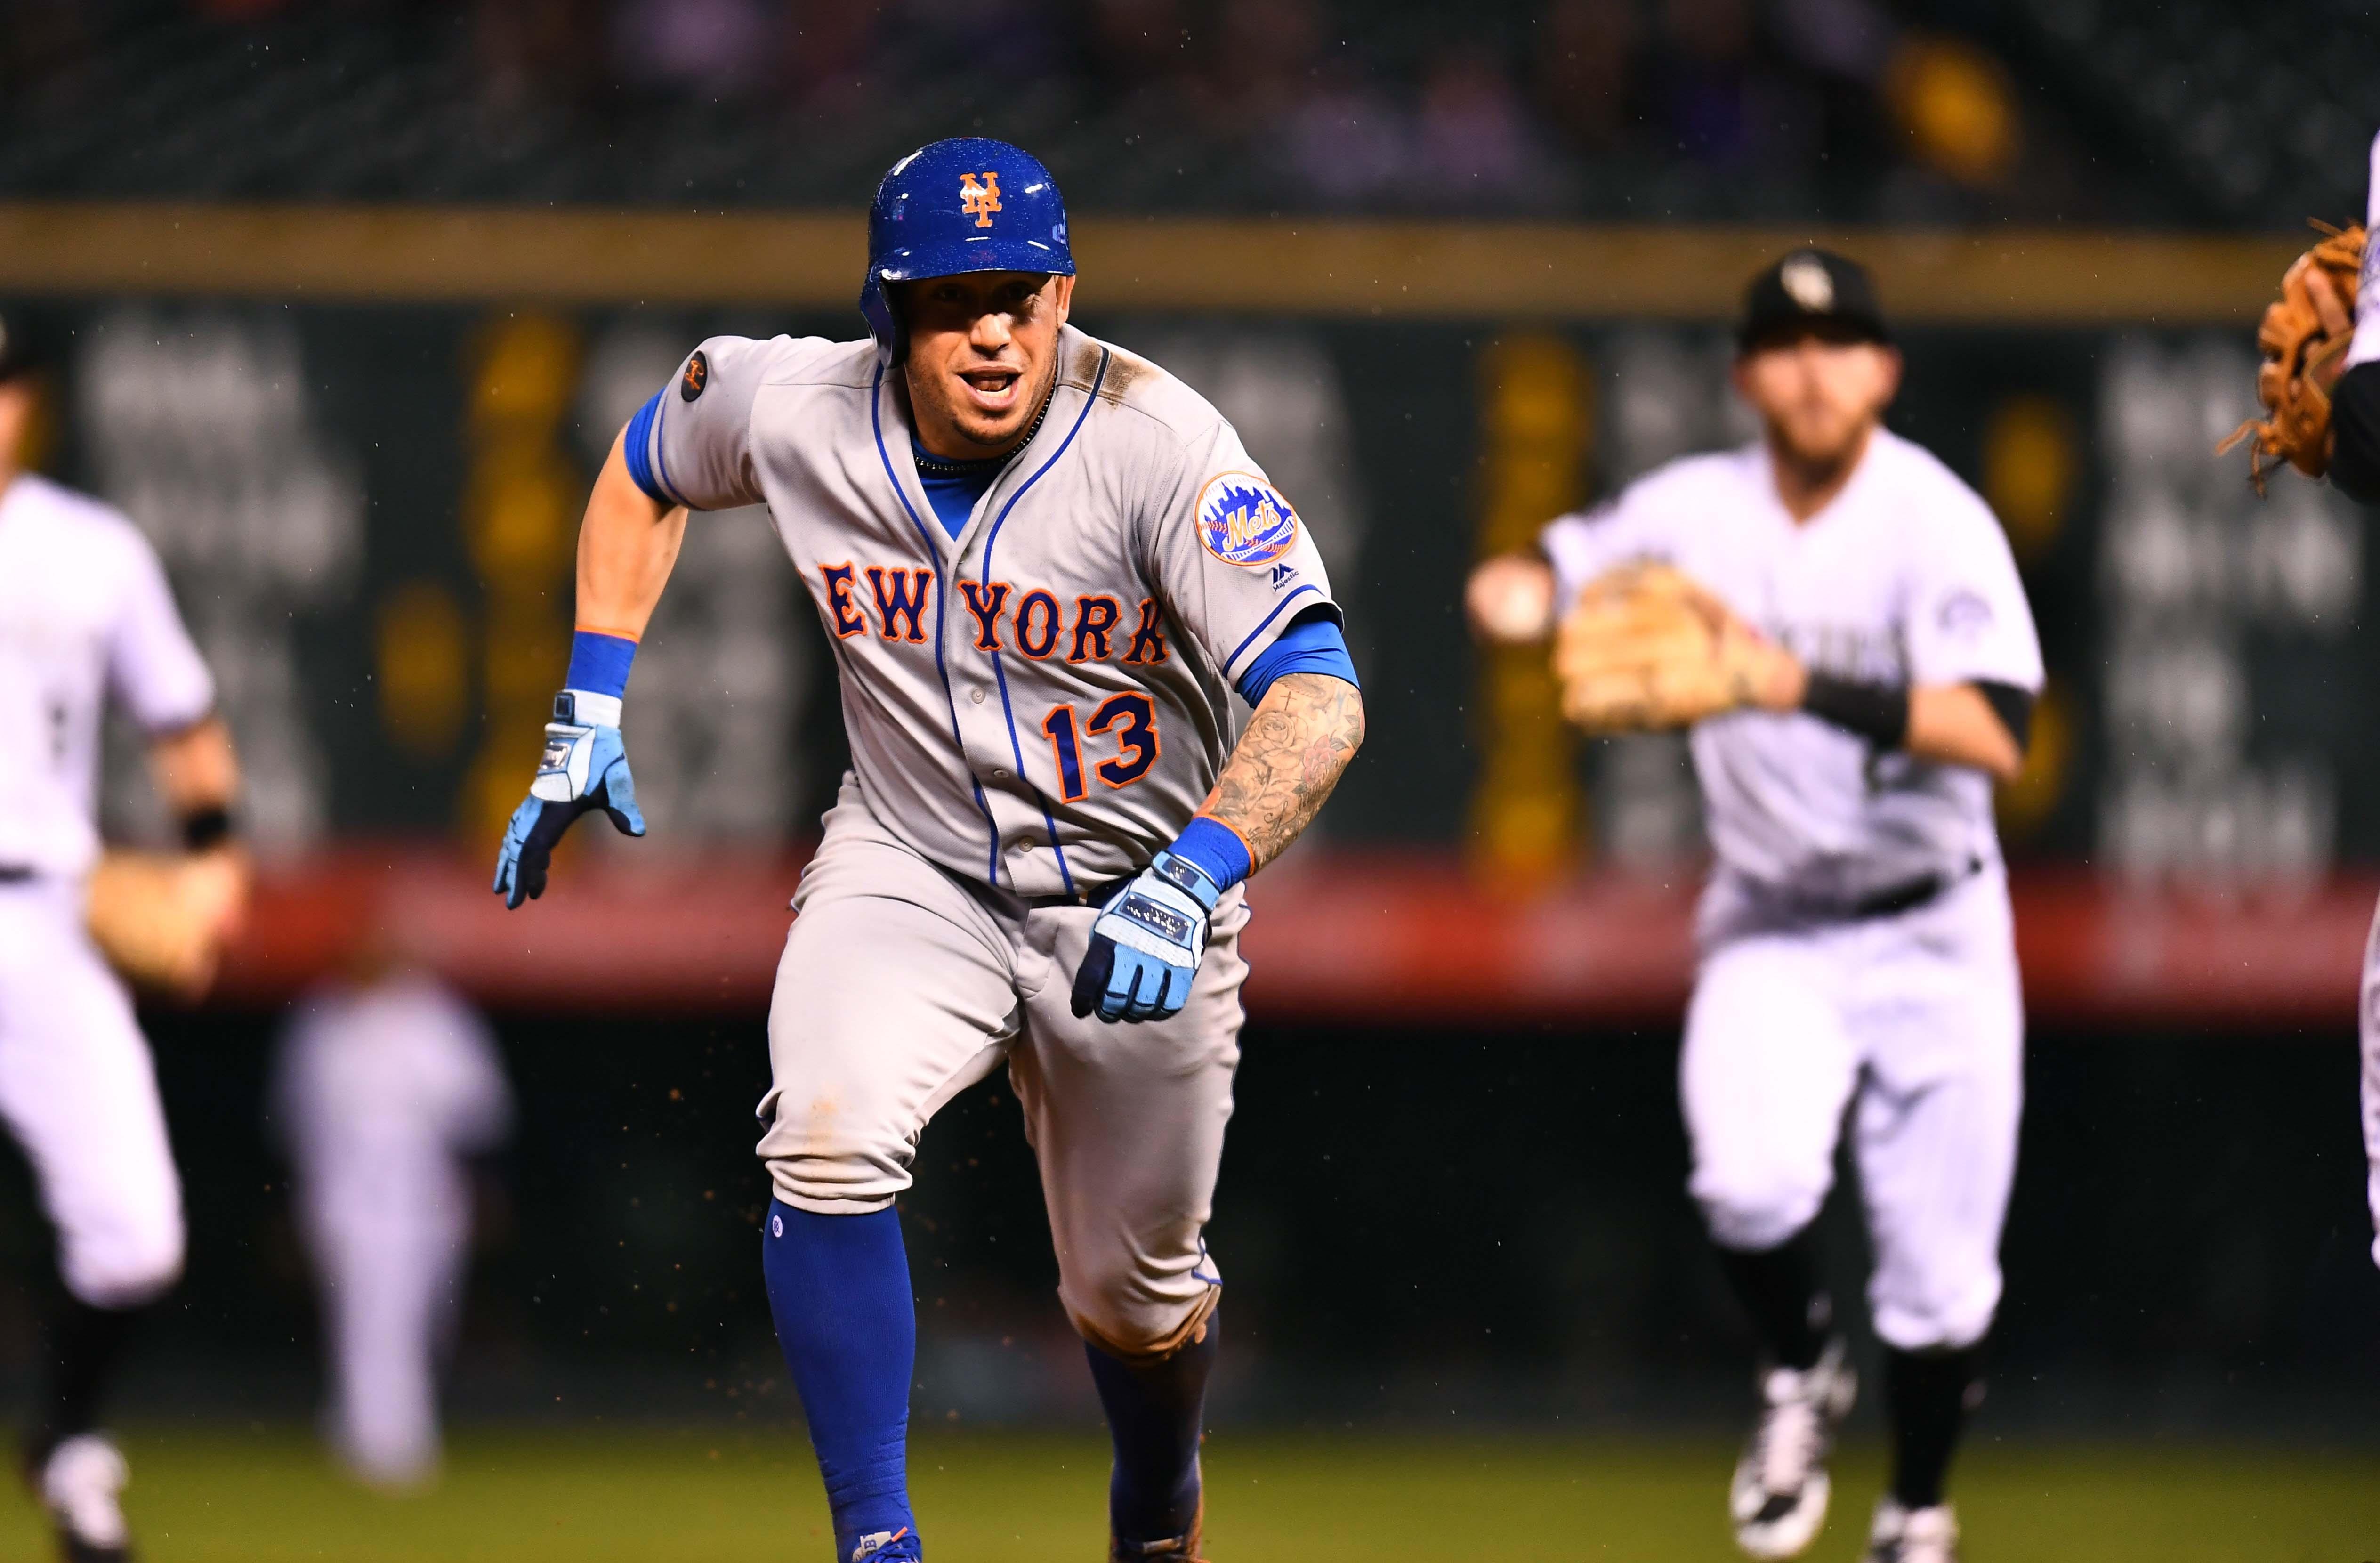 6/20/18 Game Preview: New York Mets at Colorado Rockies